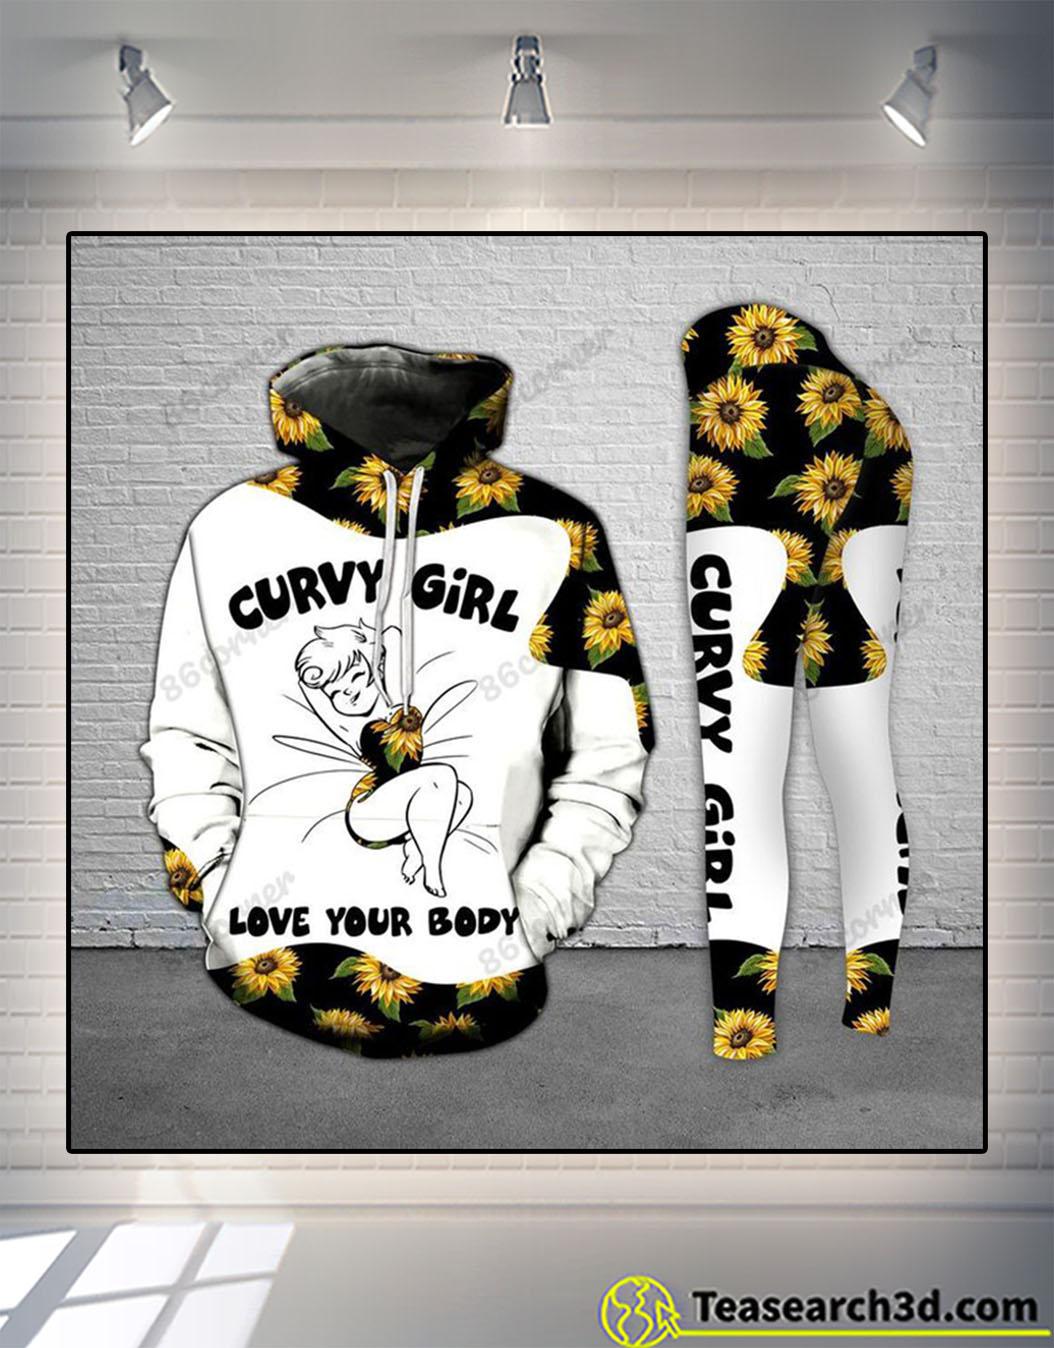 Curvy girl light sunflower legging and hoodie